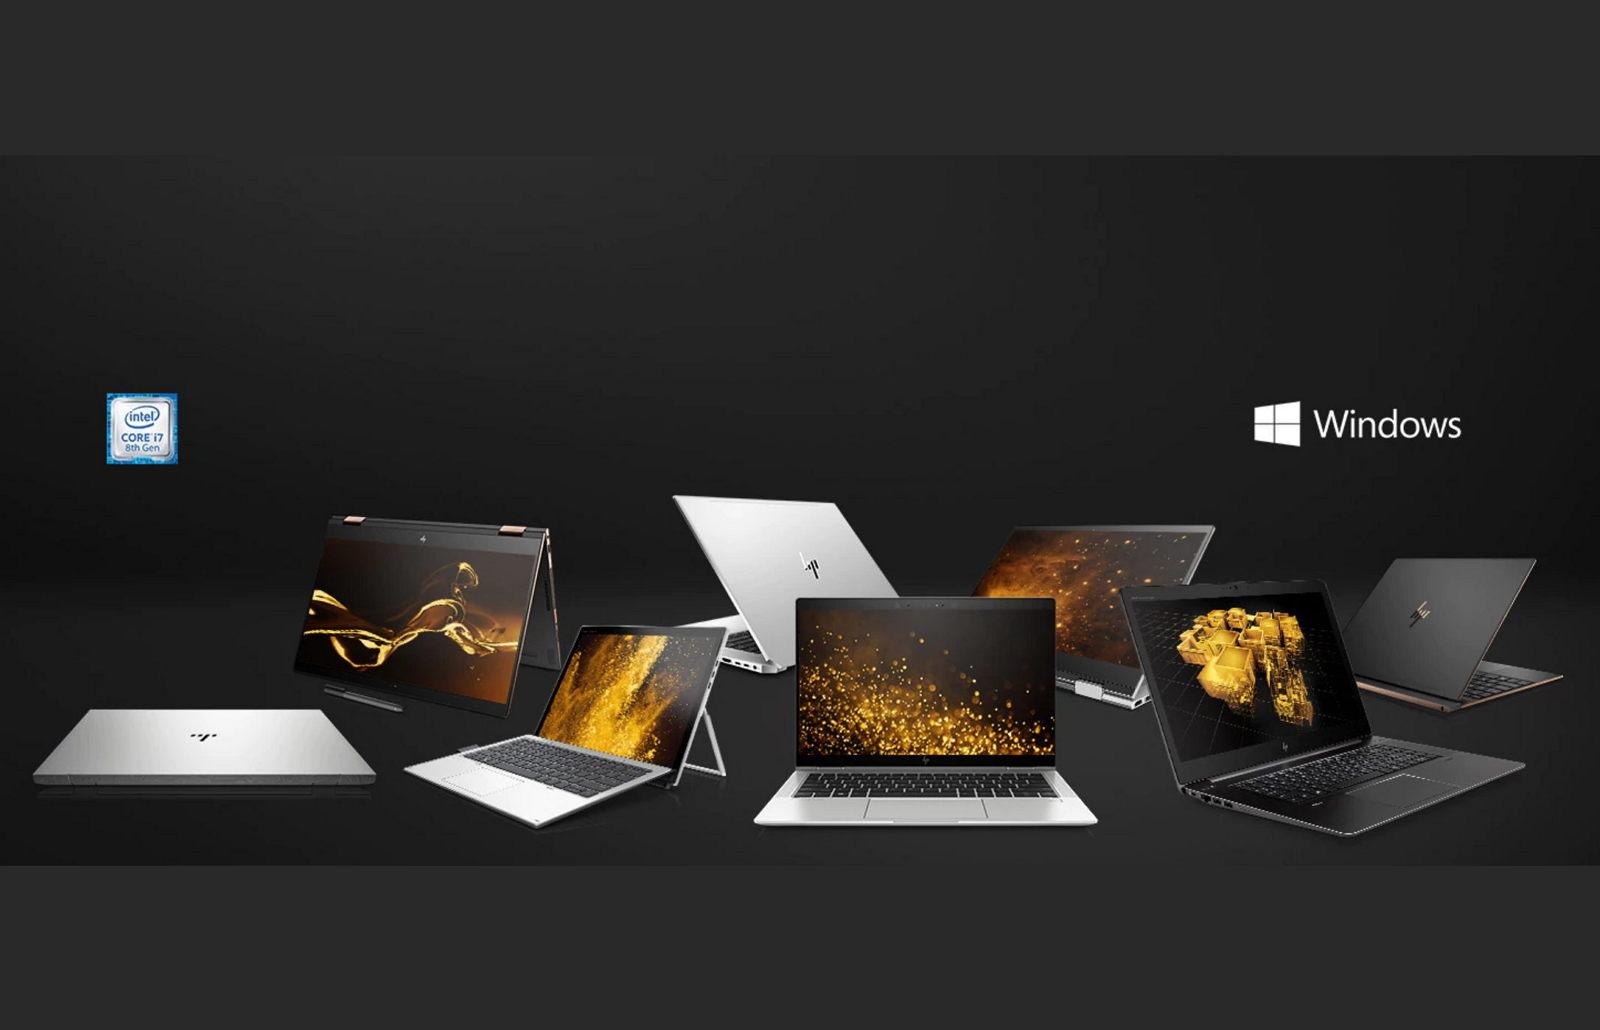 HP premium laptop, convertible, desktop lineup for 2018